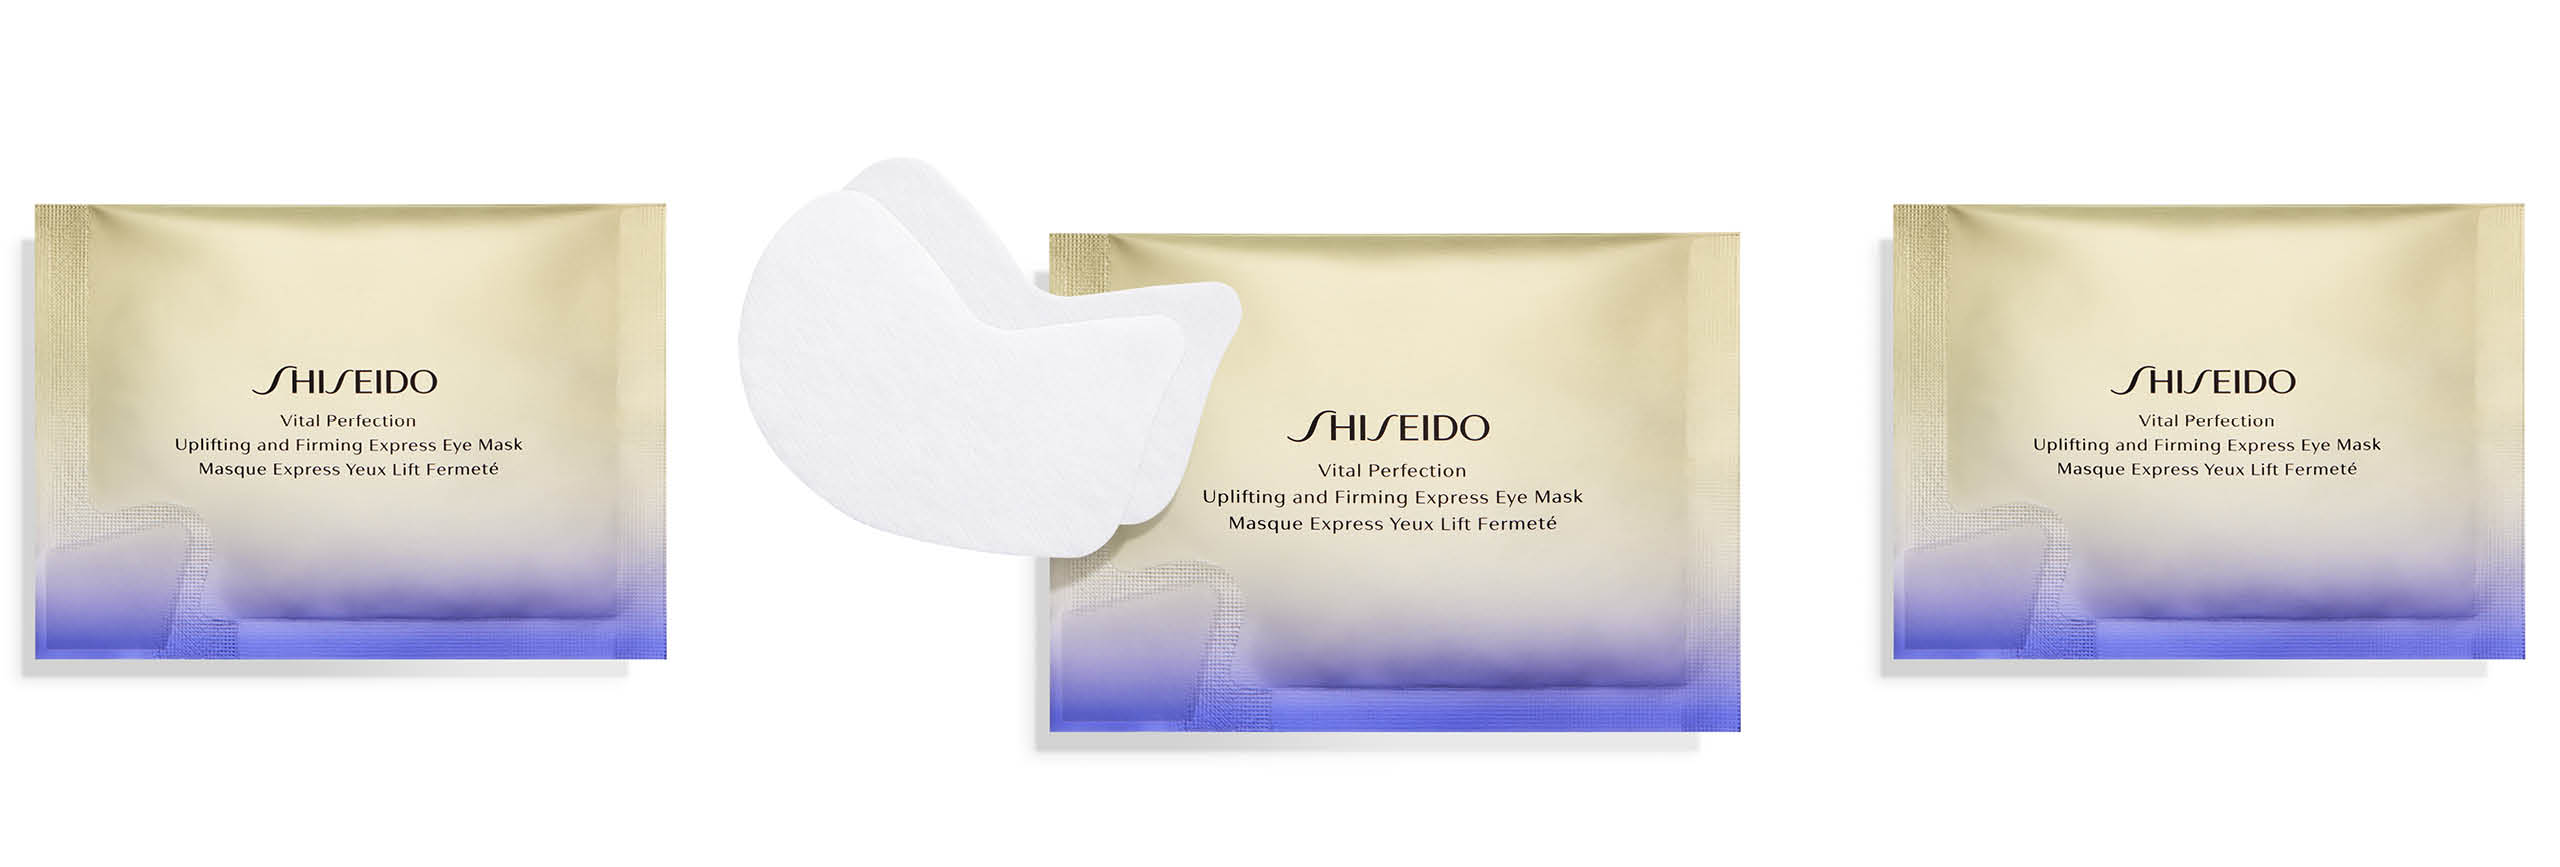 Shiseido Eye Pads